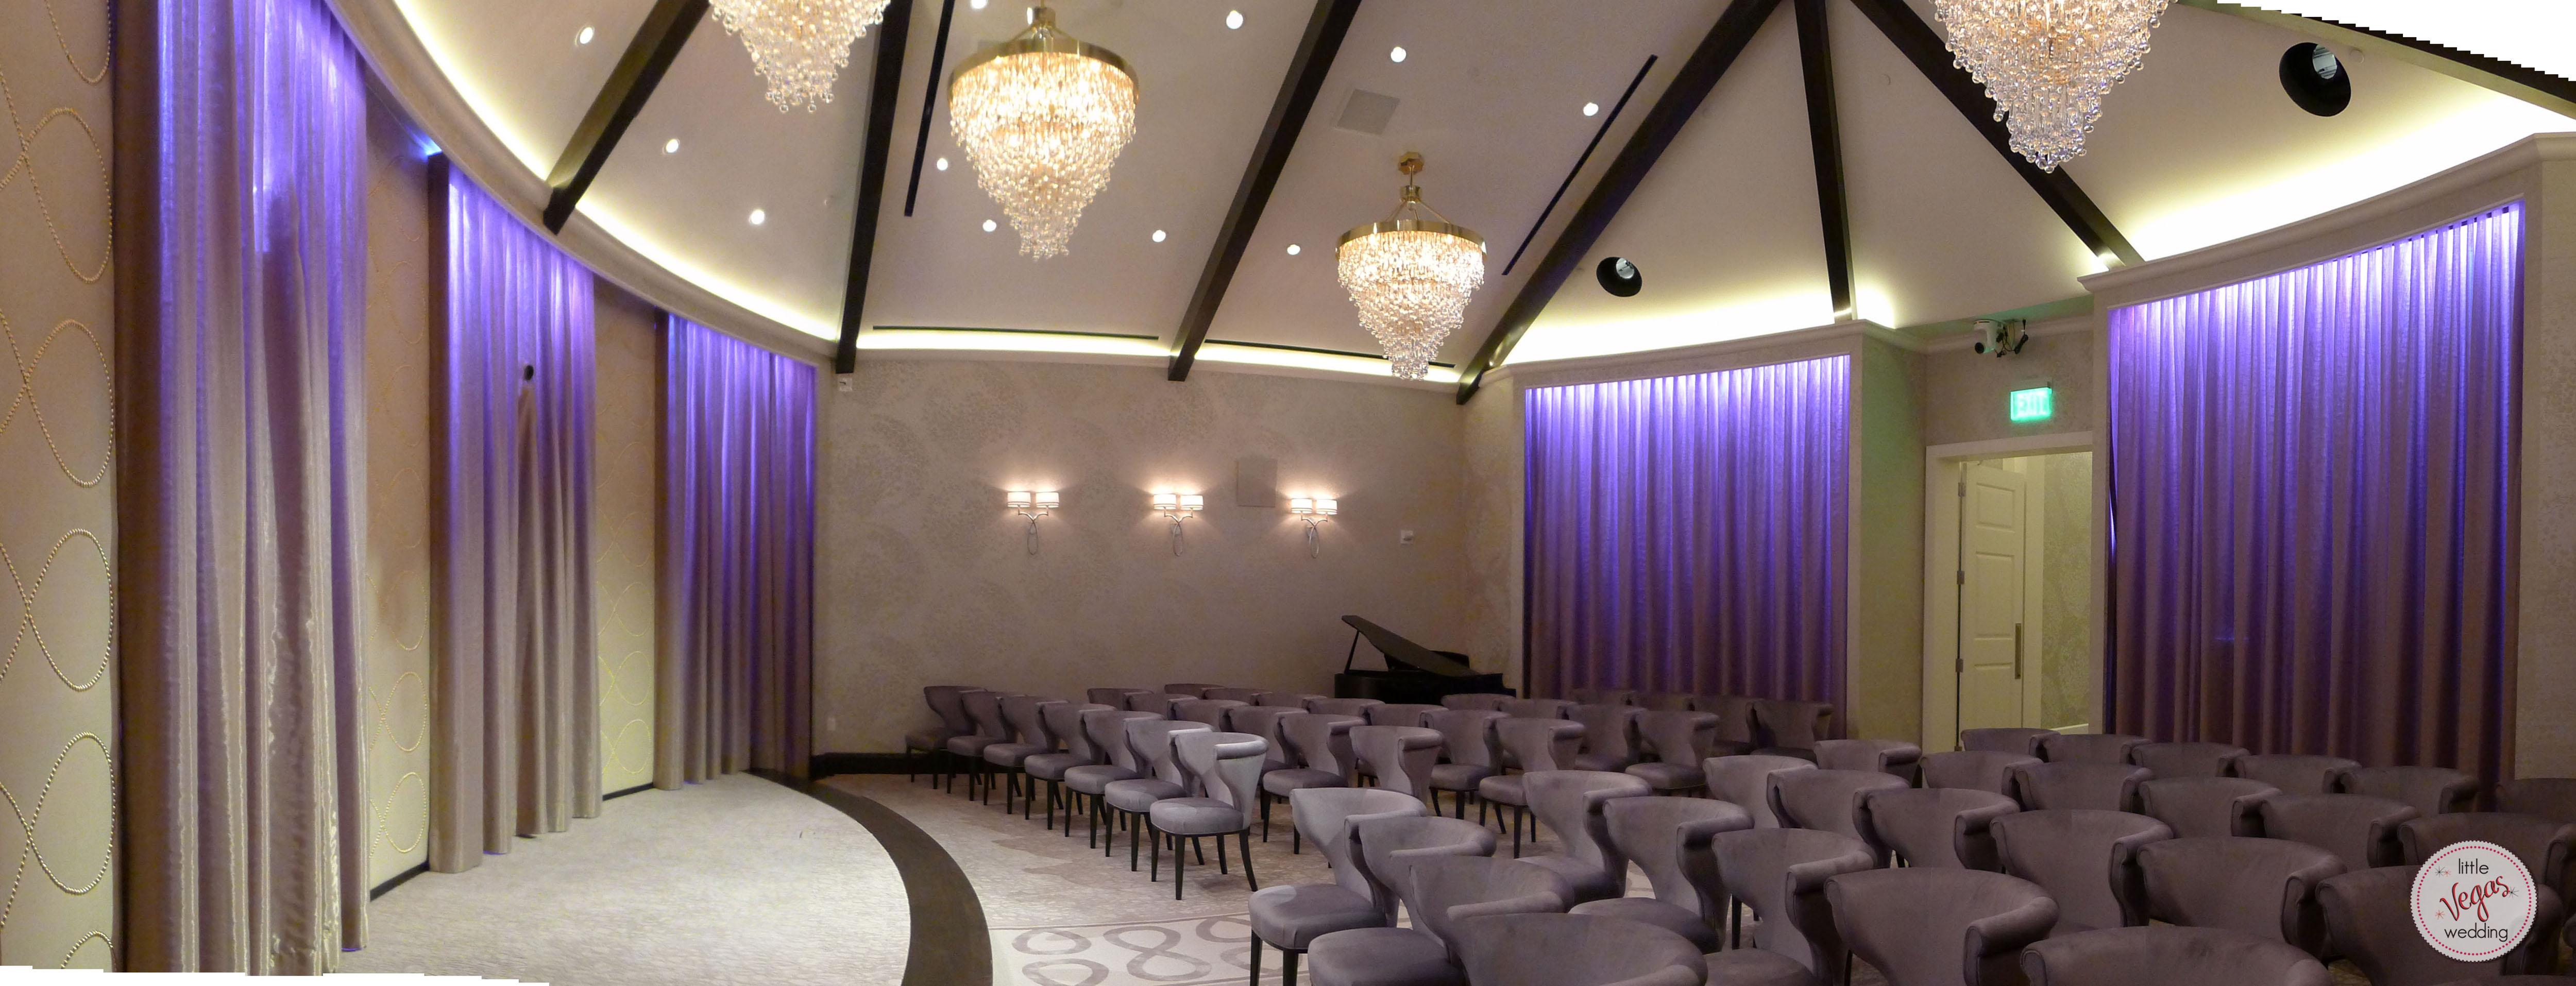 ARIA Las Vegass Wedding Chapel